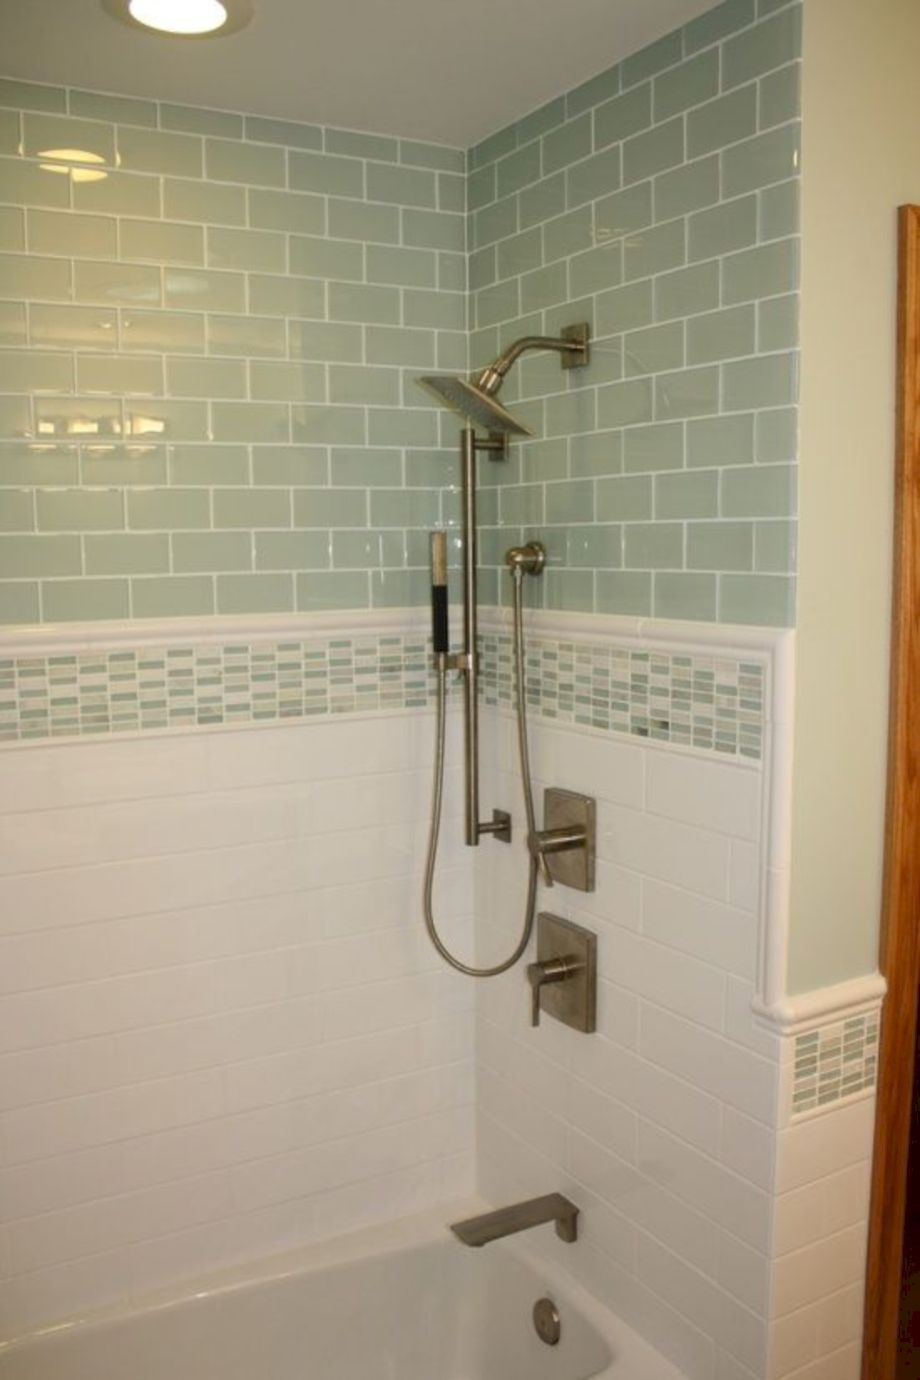 Bathroom Subway Tile Design Best 13 Bathroom Tile Design Ideas  Bathroom Subway Tiles Cozy